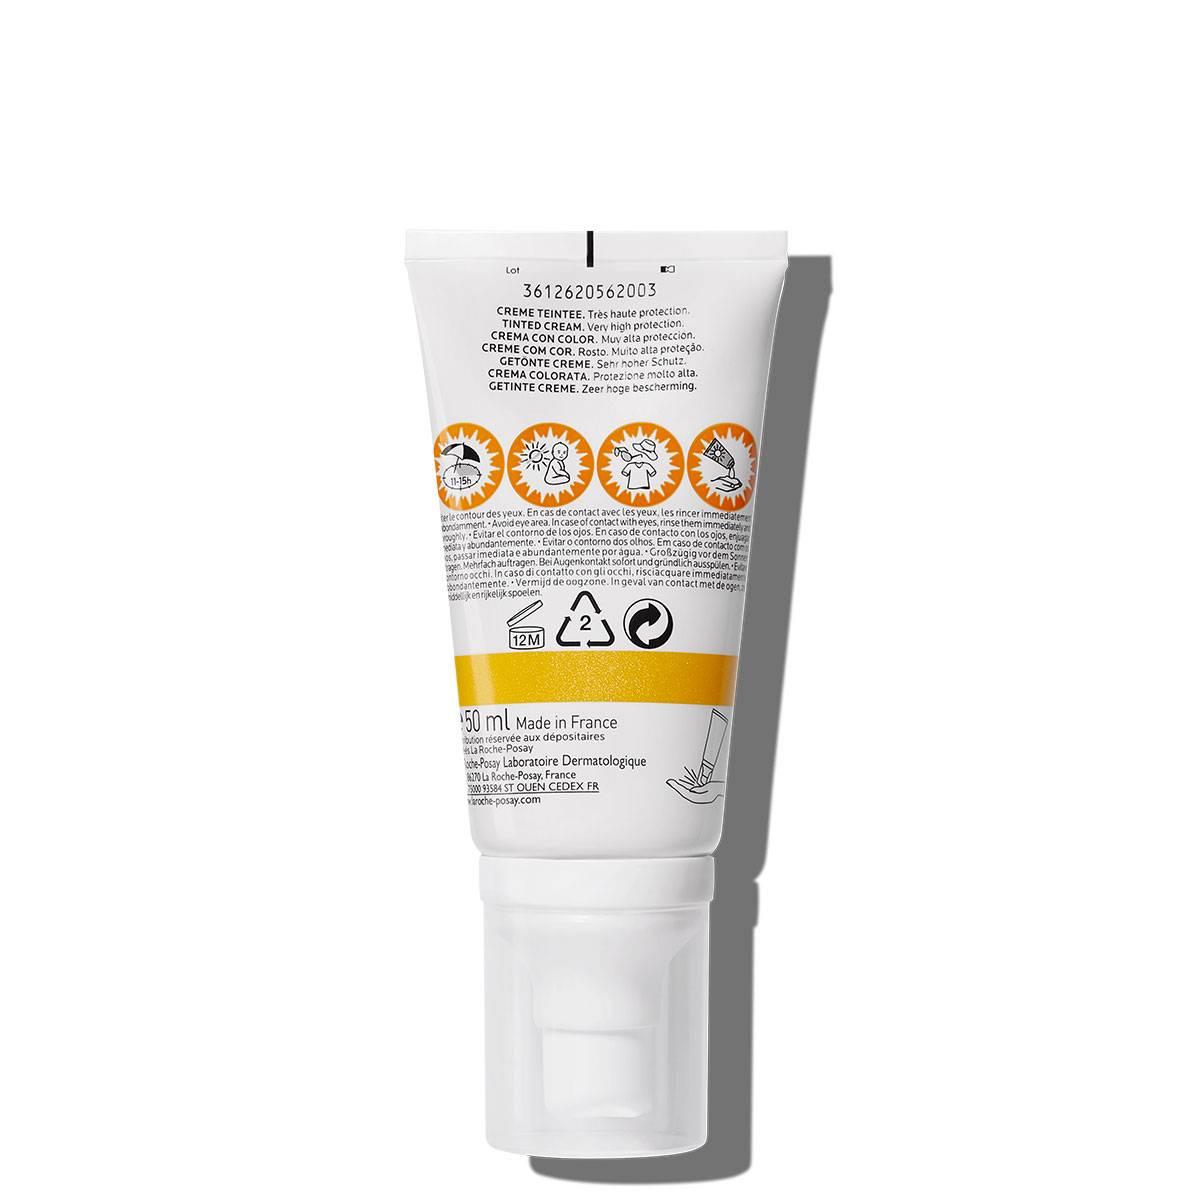 La Roche Posay Tuotesivu AurinkoAnthelios Pigmentation Tinted Cream Spf